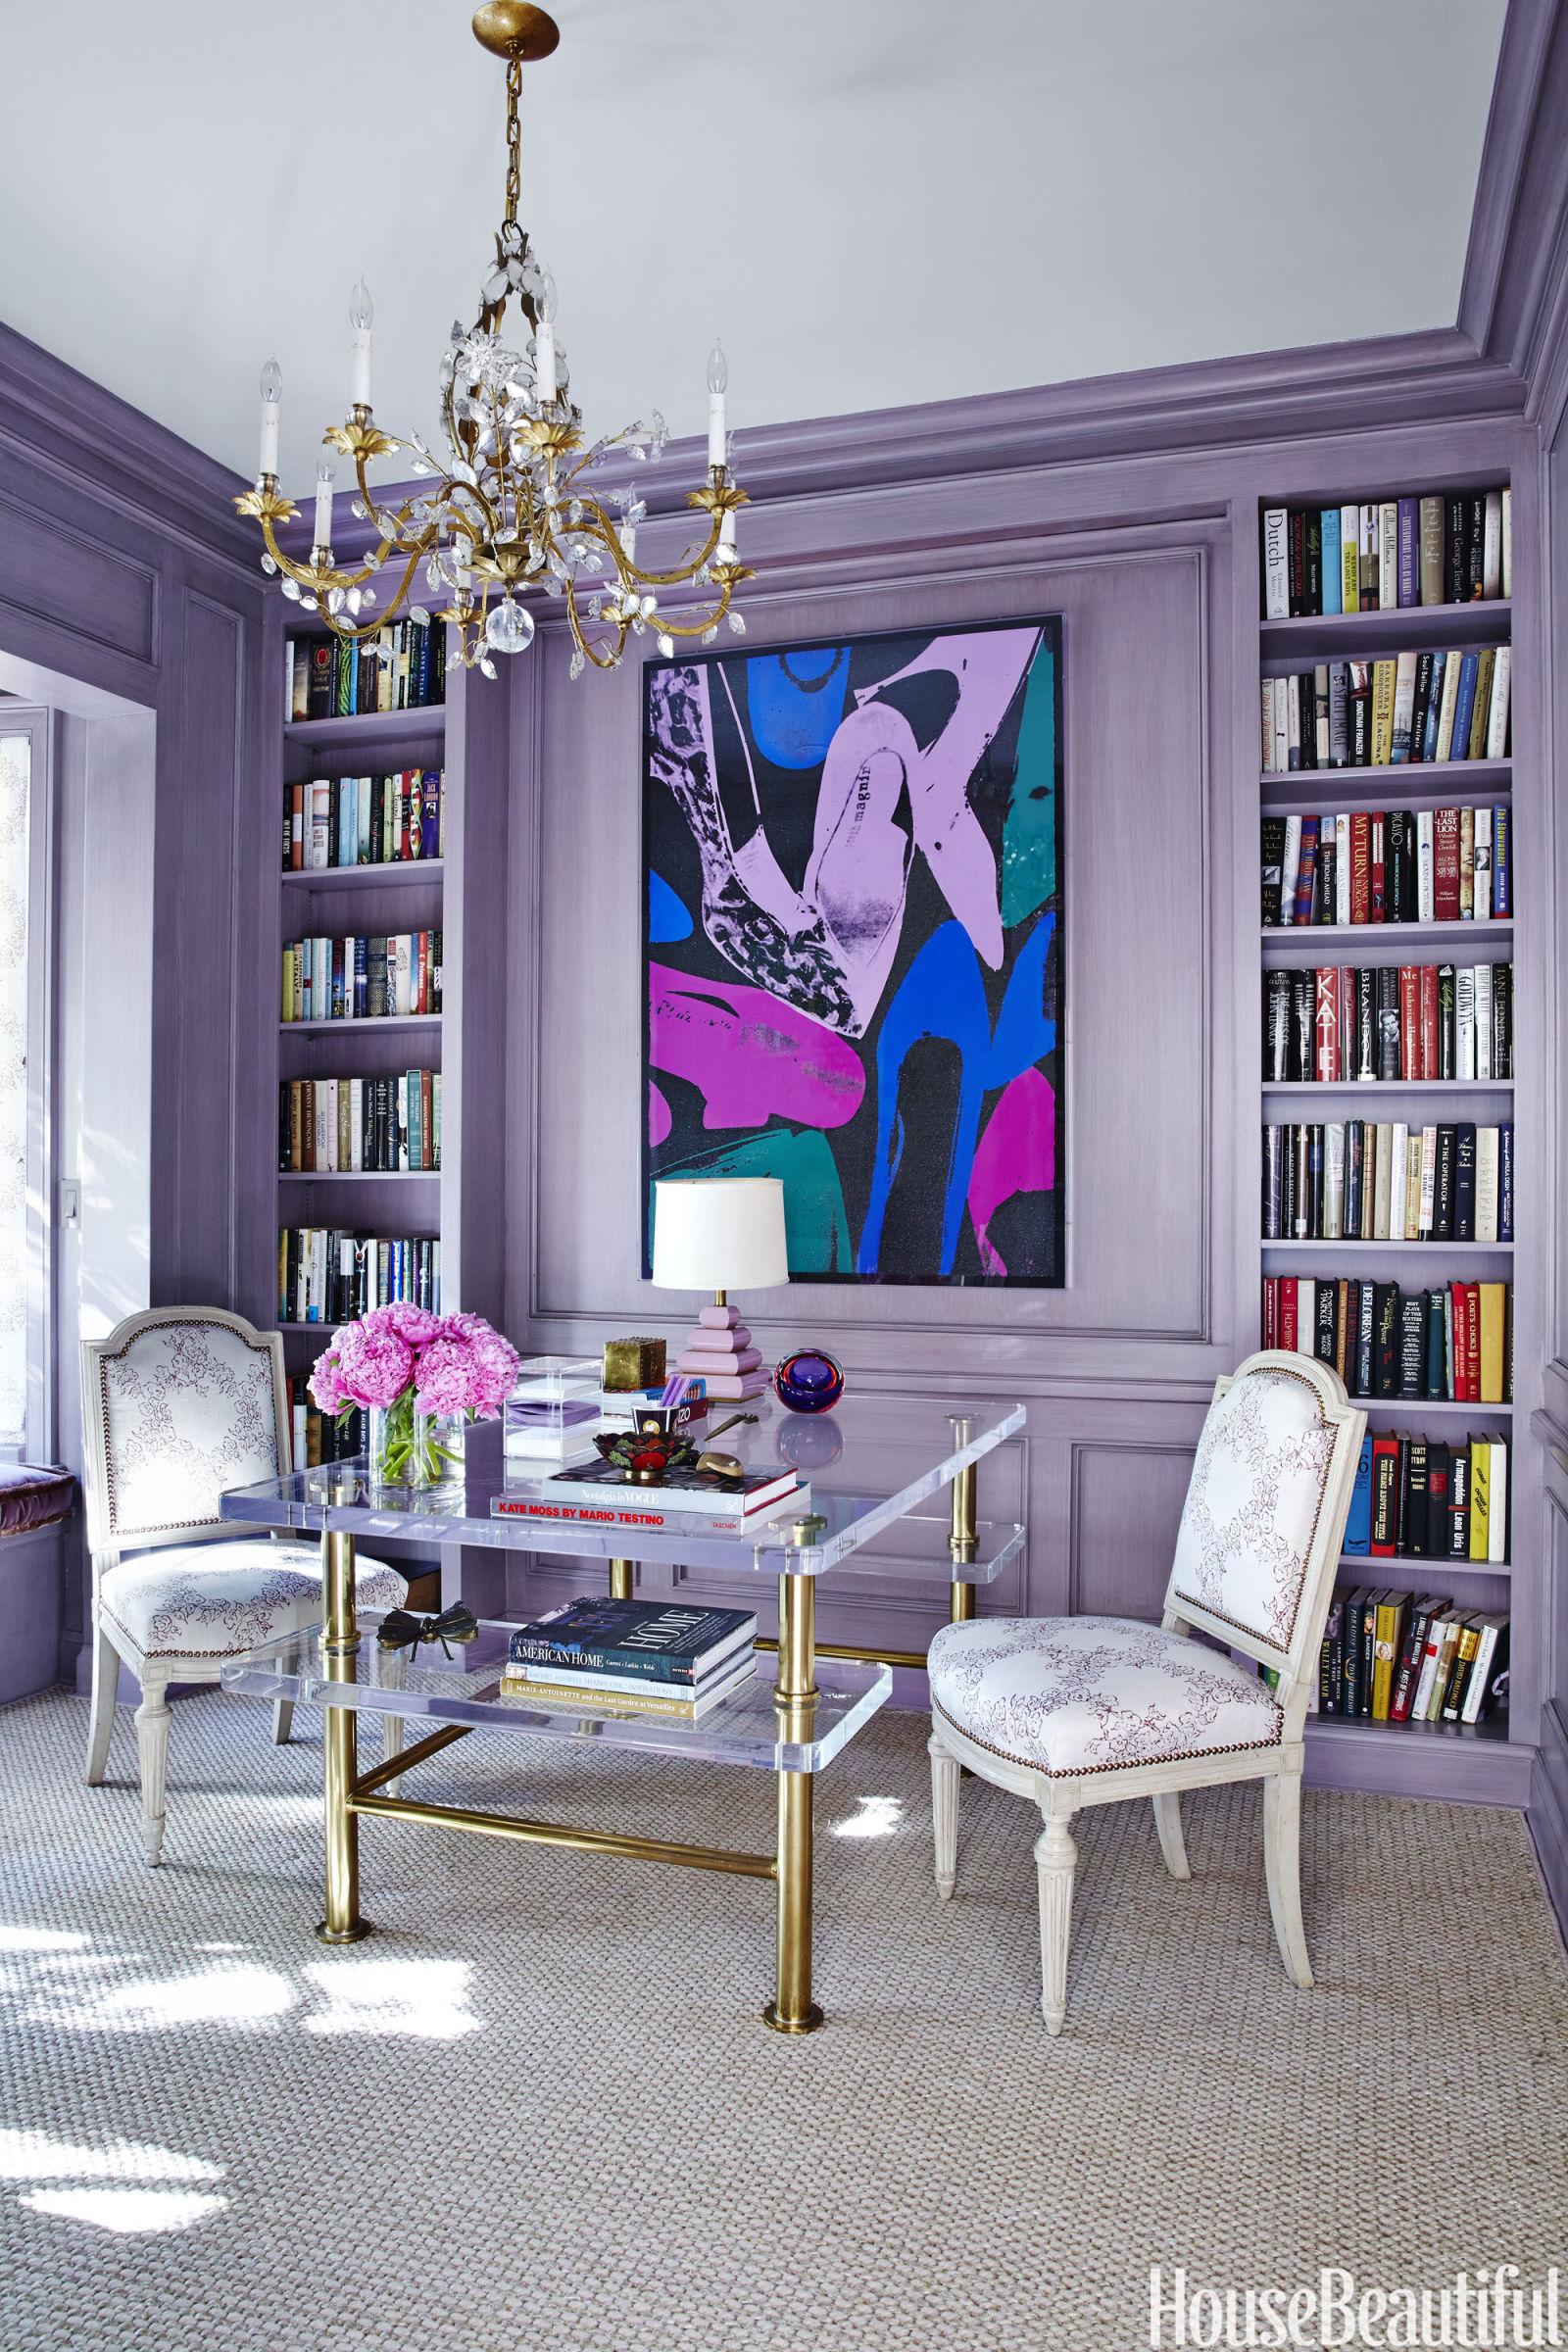 gallery-1440172022-purple-room-with-painting.jpg